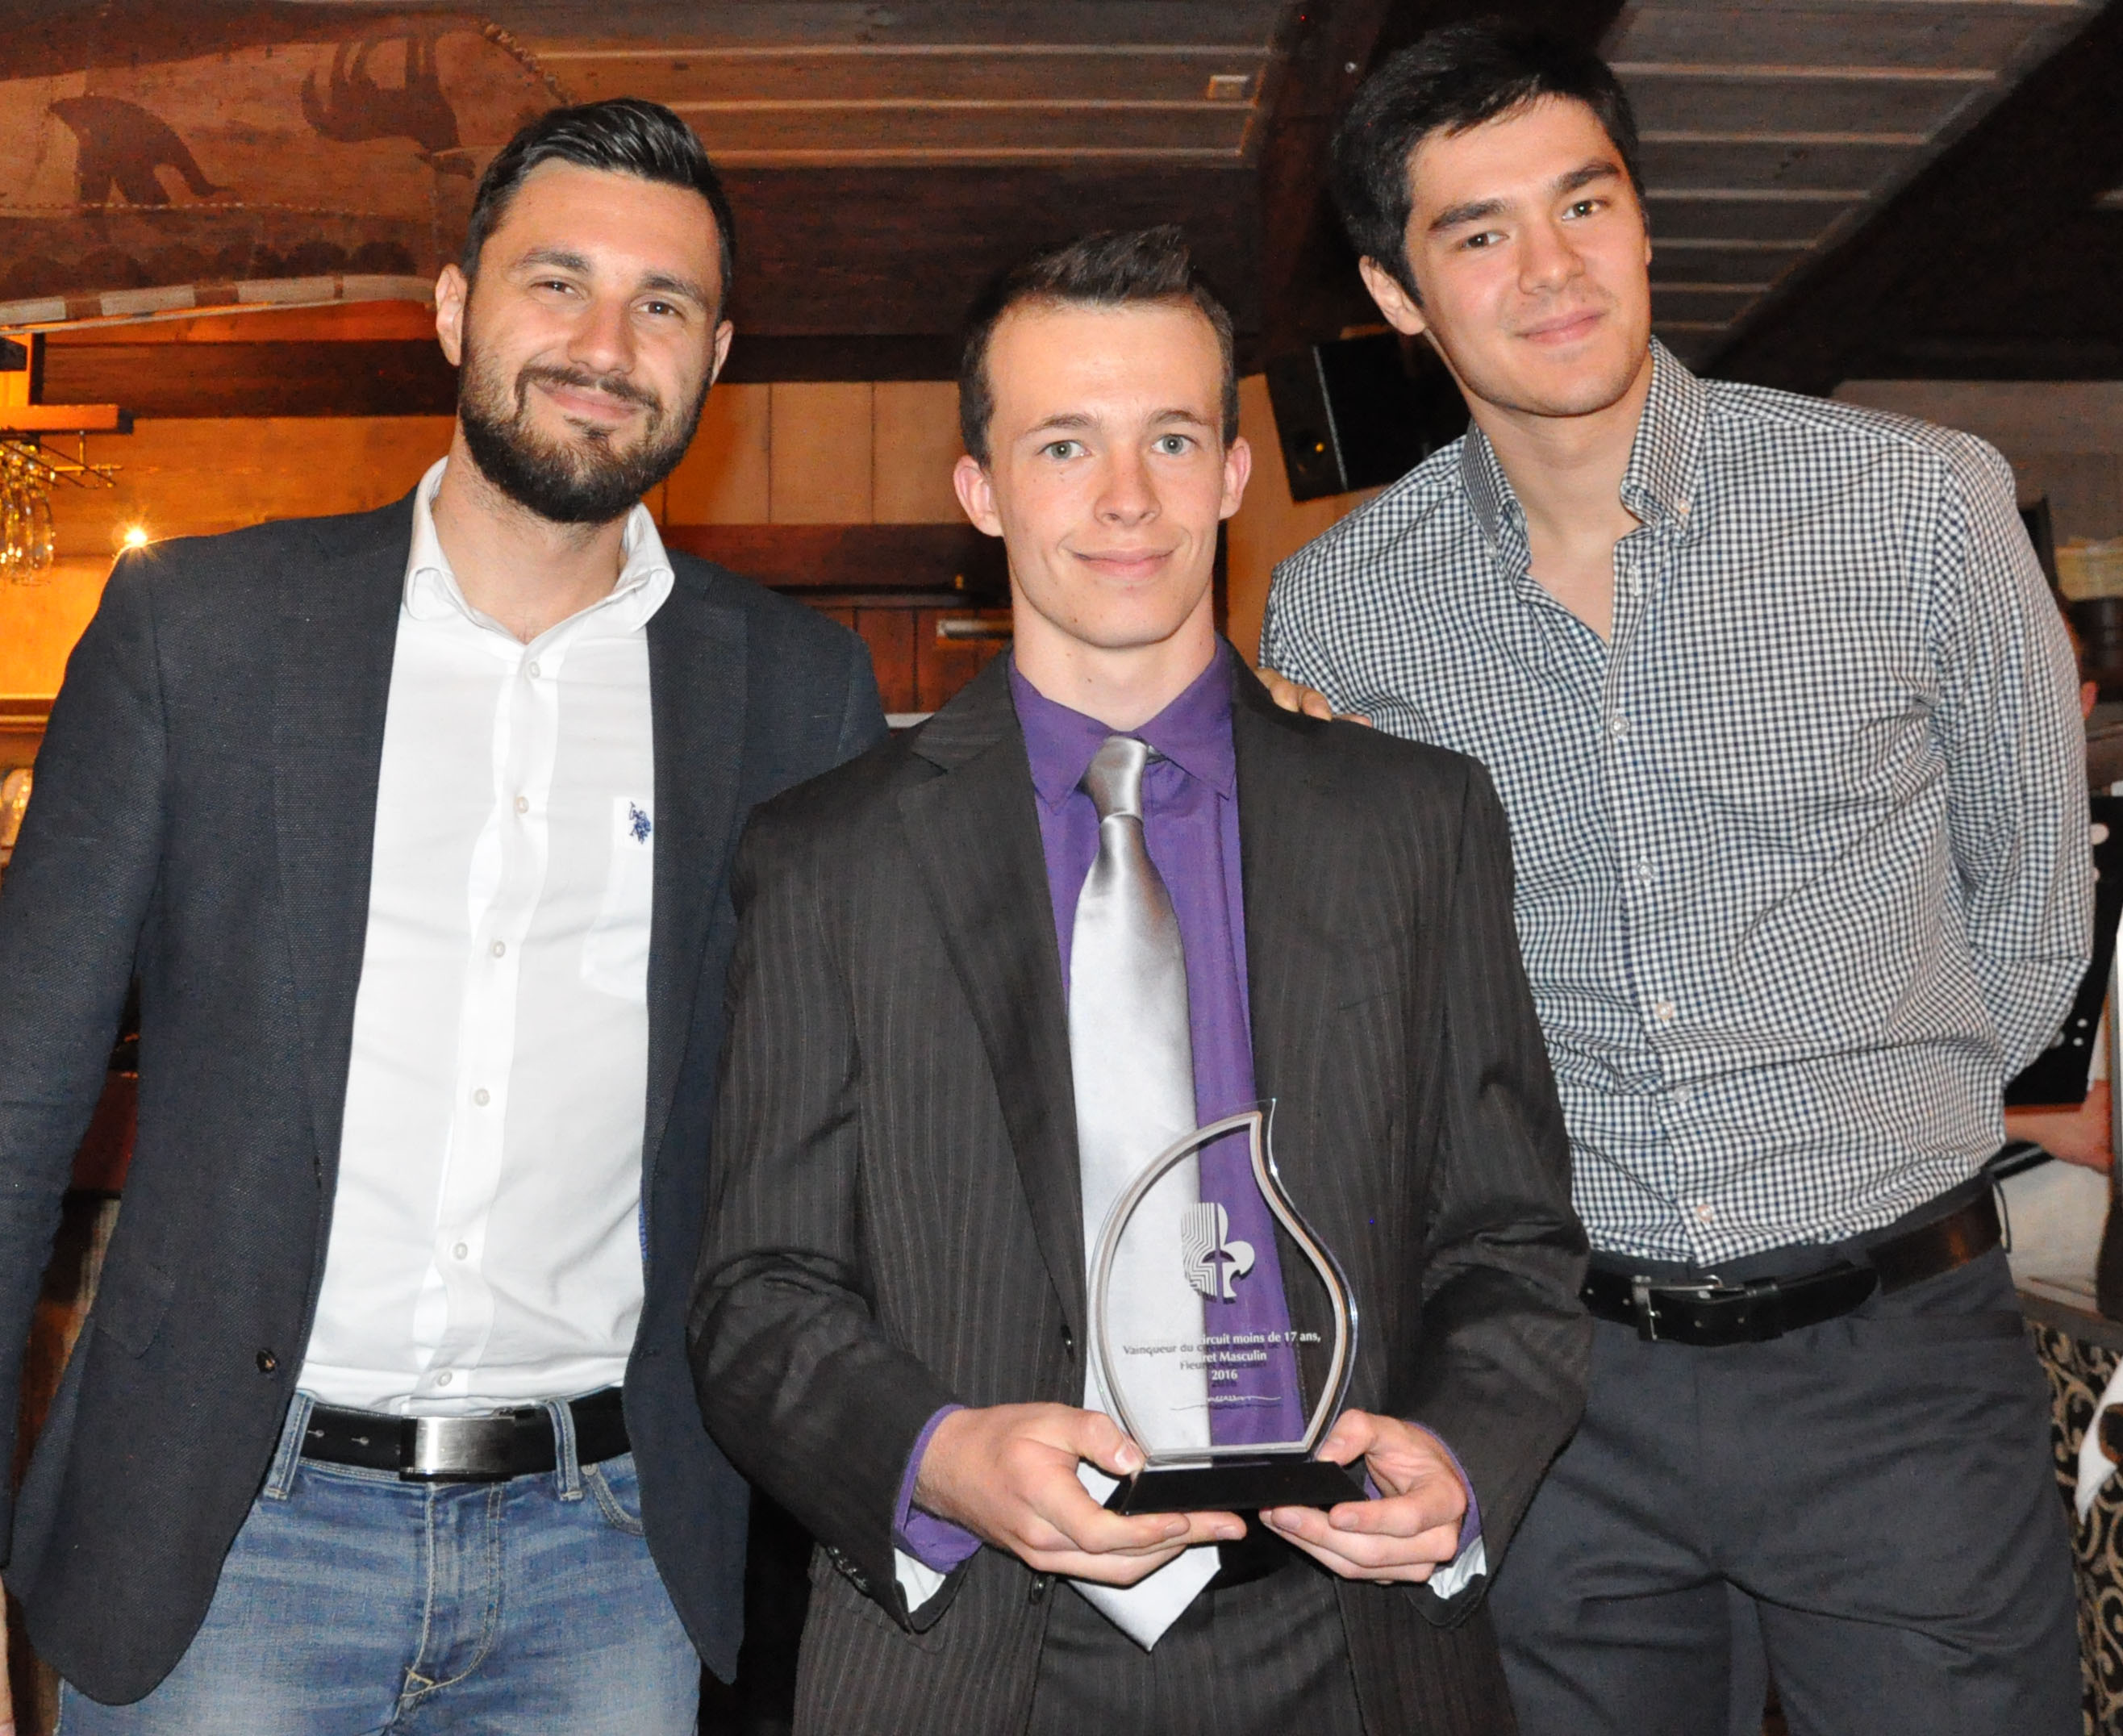 Joseph Polossifakis - Francis Bouchard - Maximilien Van Haaster Champion Fleuret masc cadet et AAA